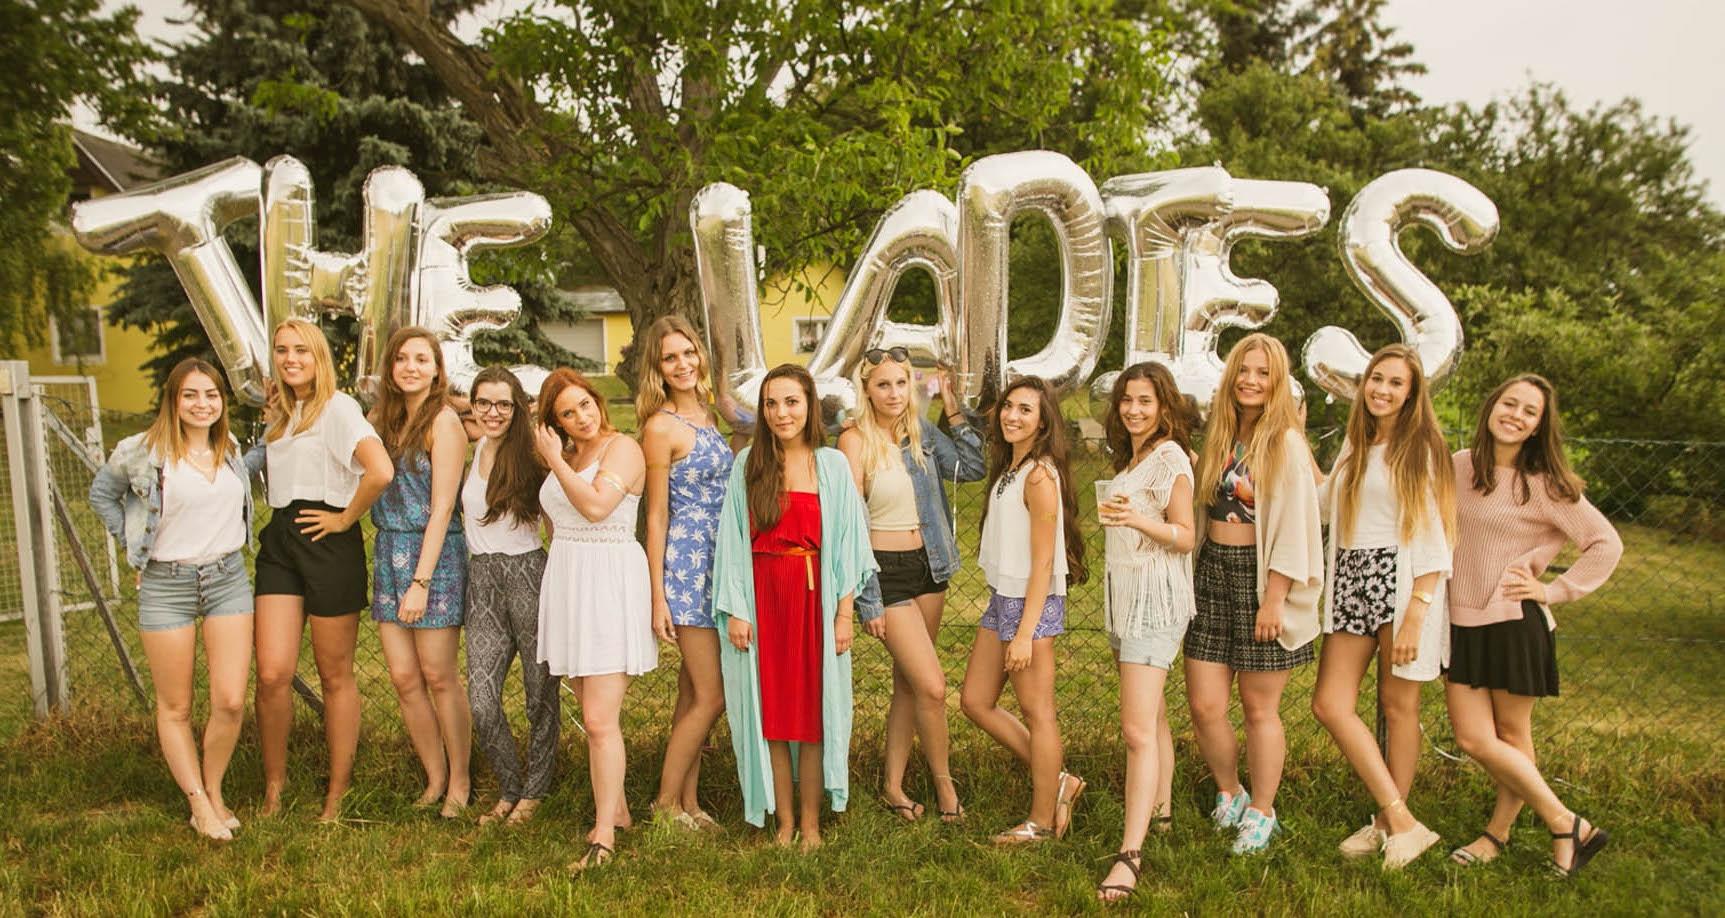 the ladies. Picknick | Unsere Gartenparty!